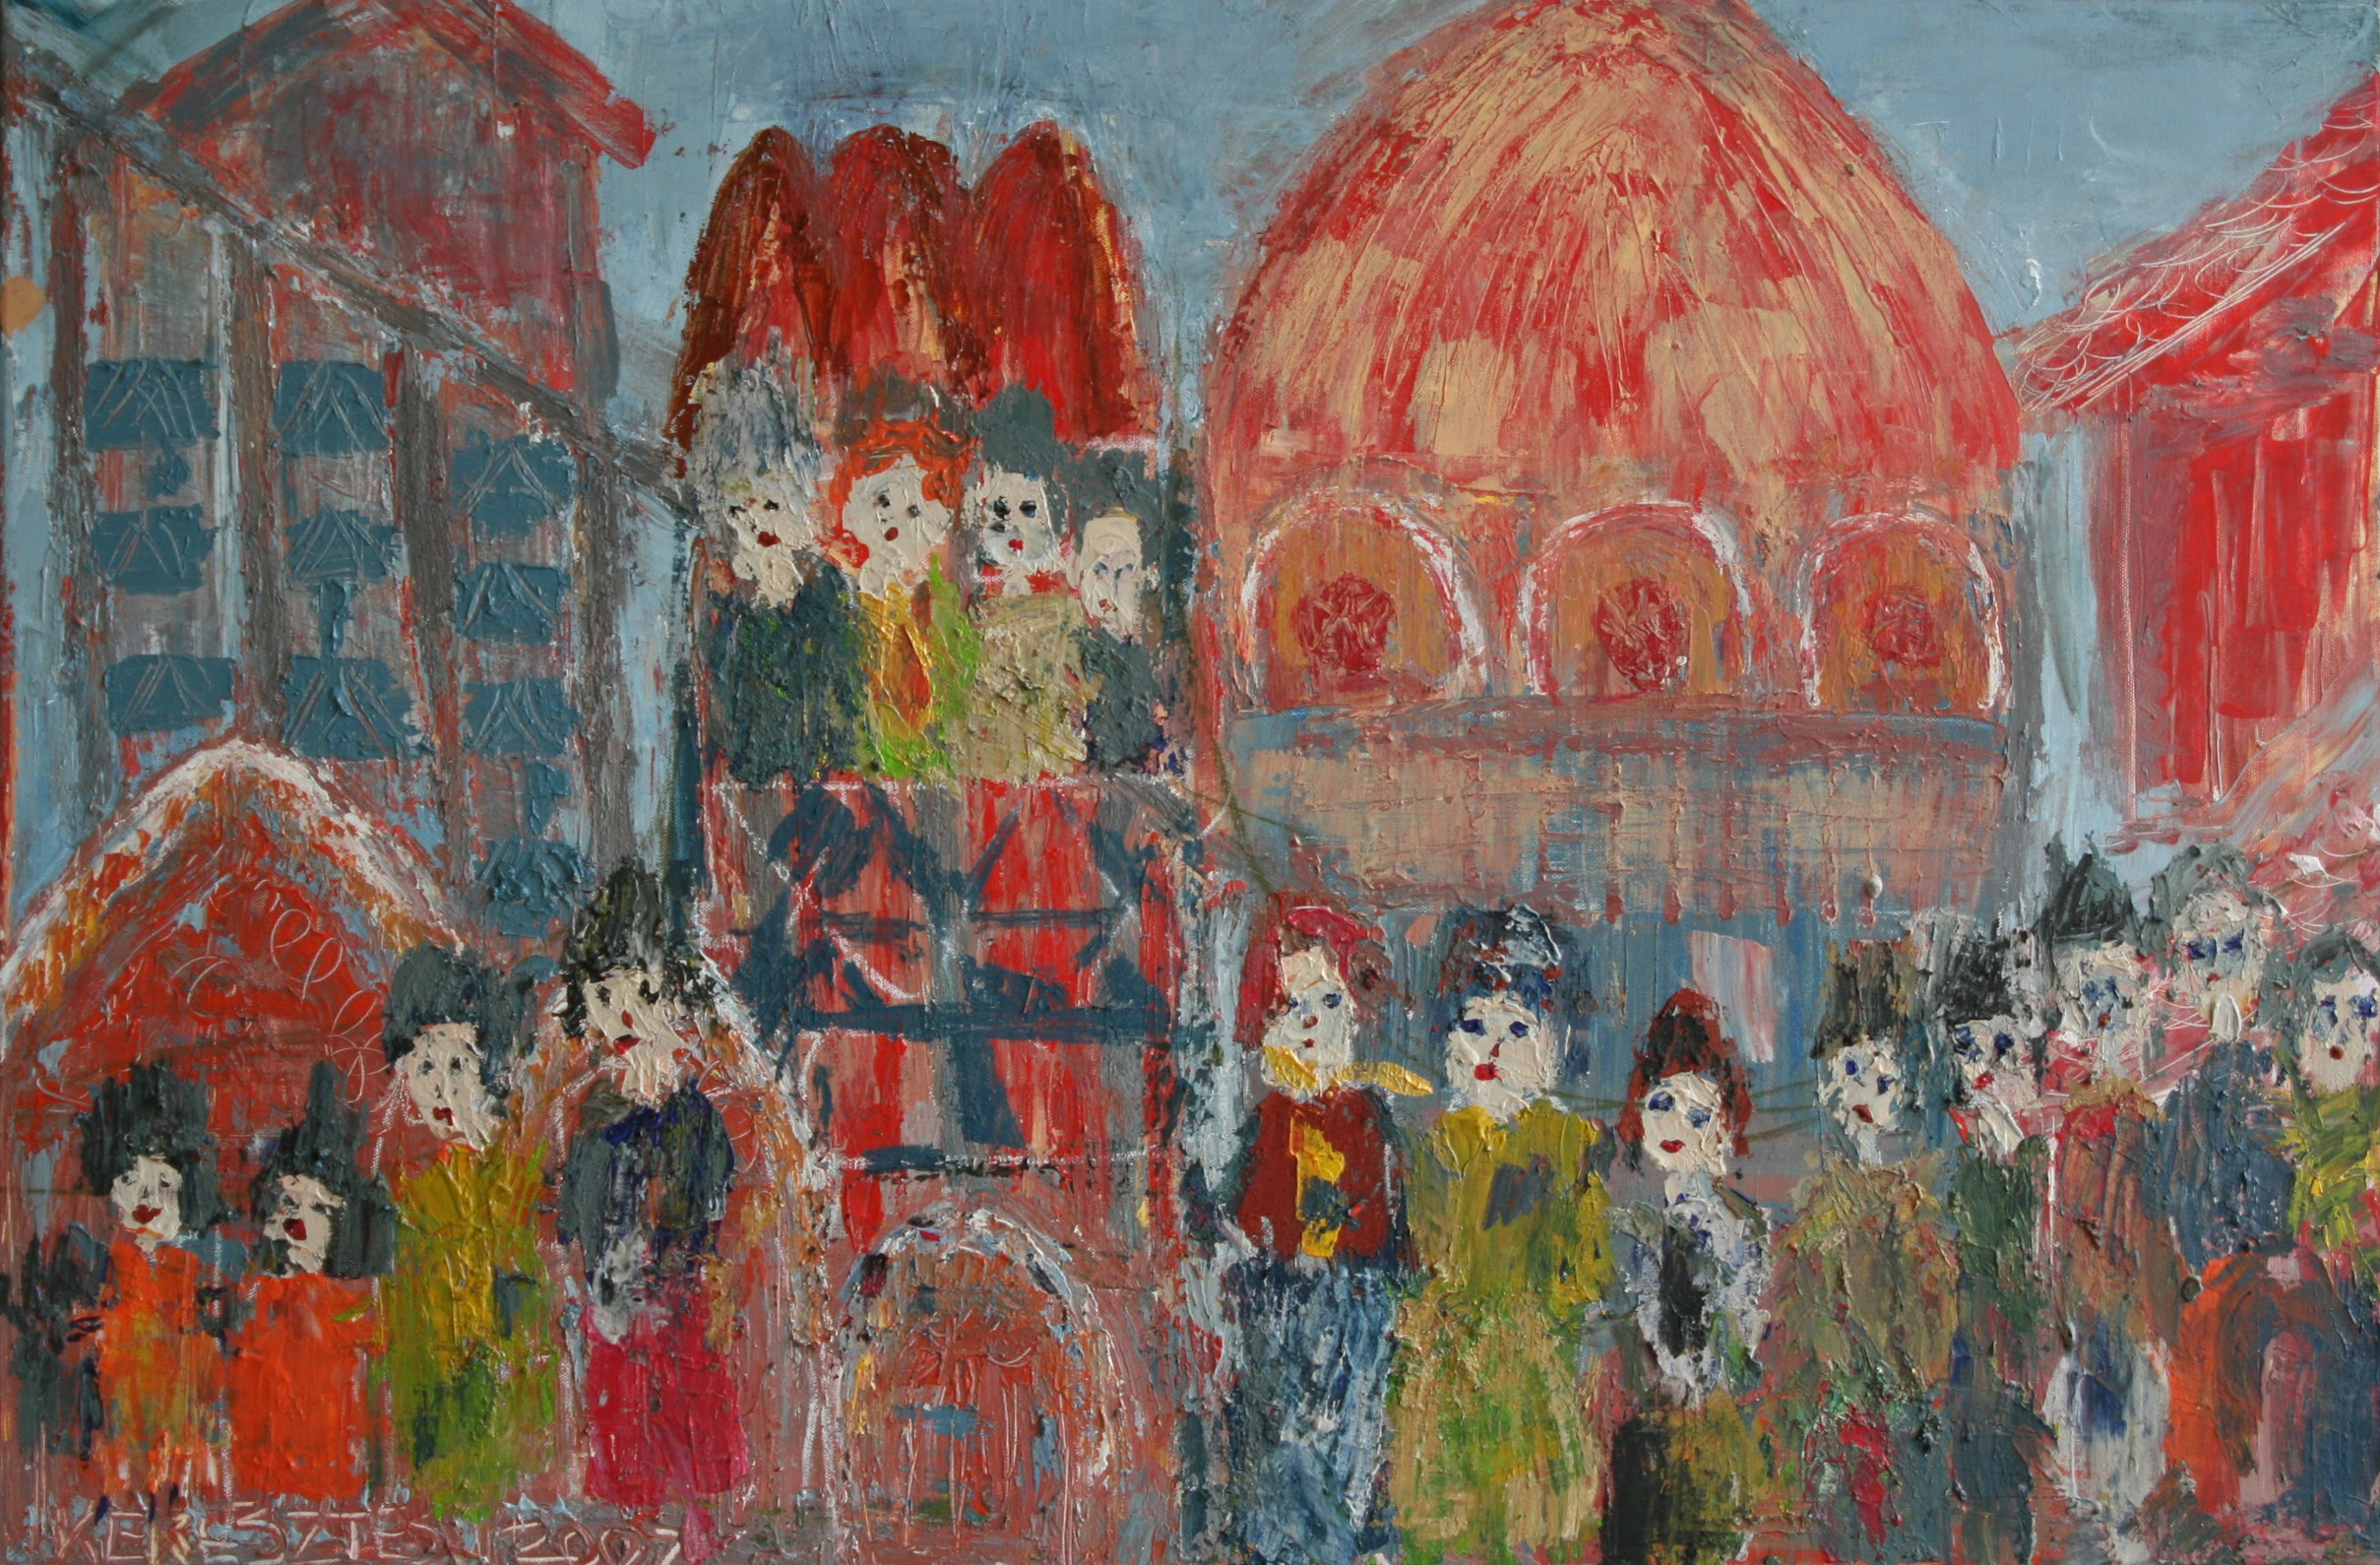 toile 56 - magdalena keresztes, artiste peintre à amiens